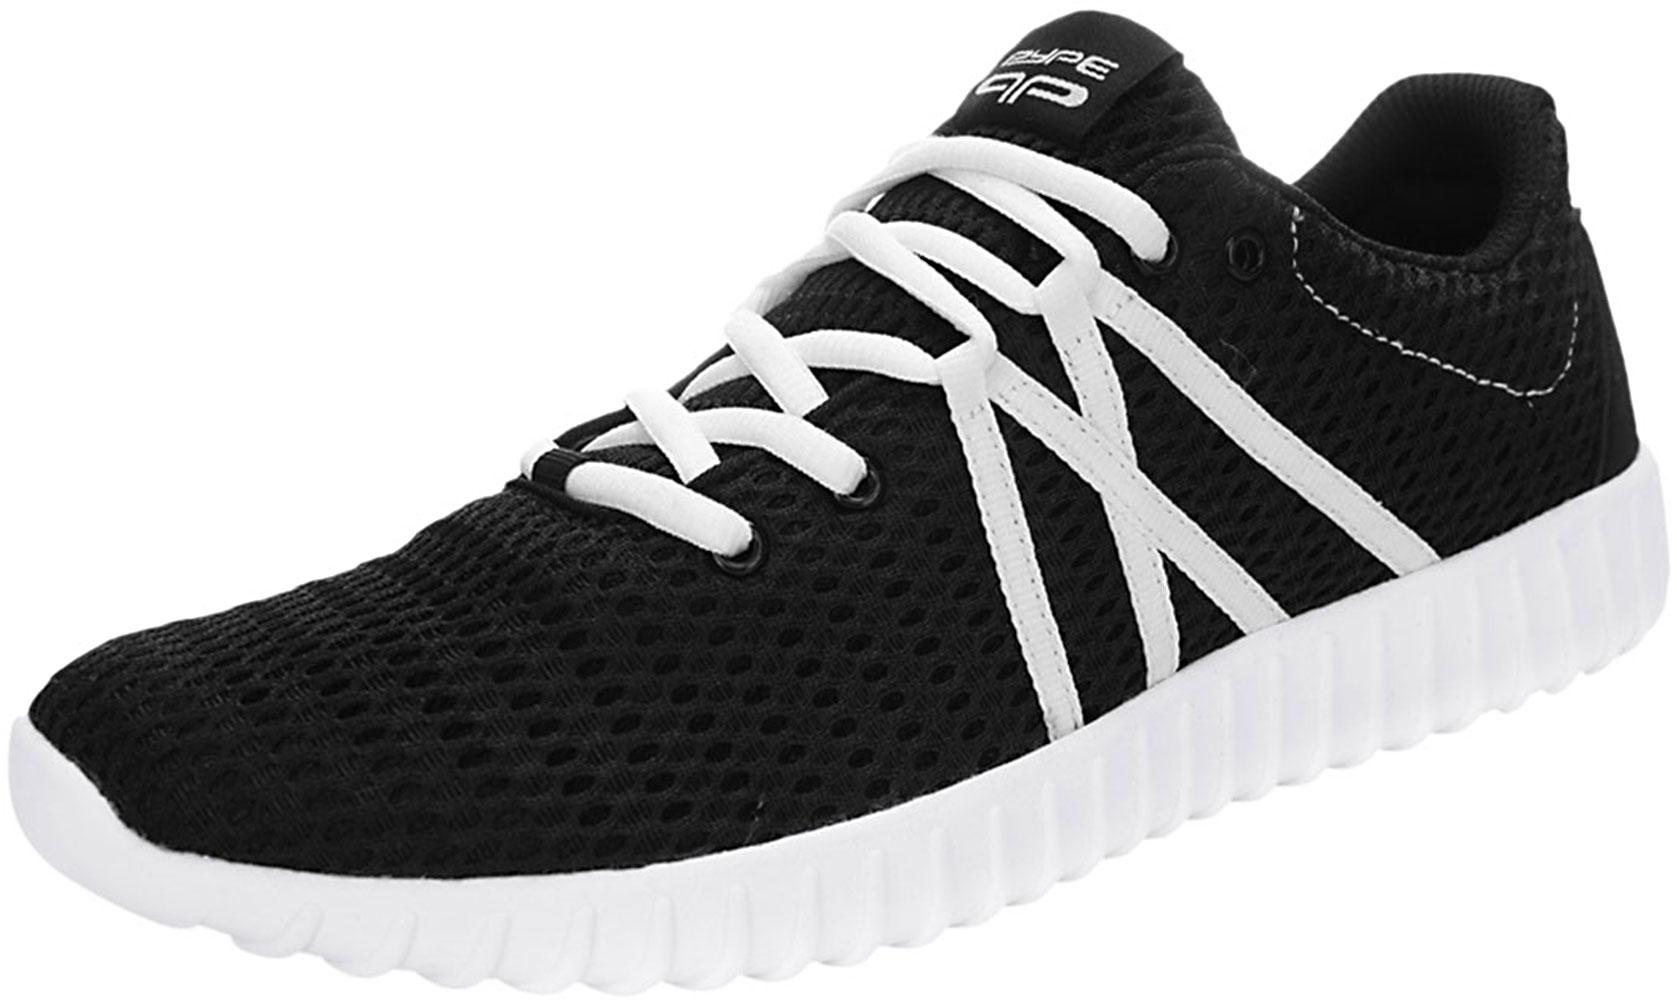 PYPE Women Contrast Color Lace Up Mesh Training Sneakers Black US 9.5